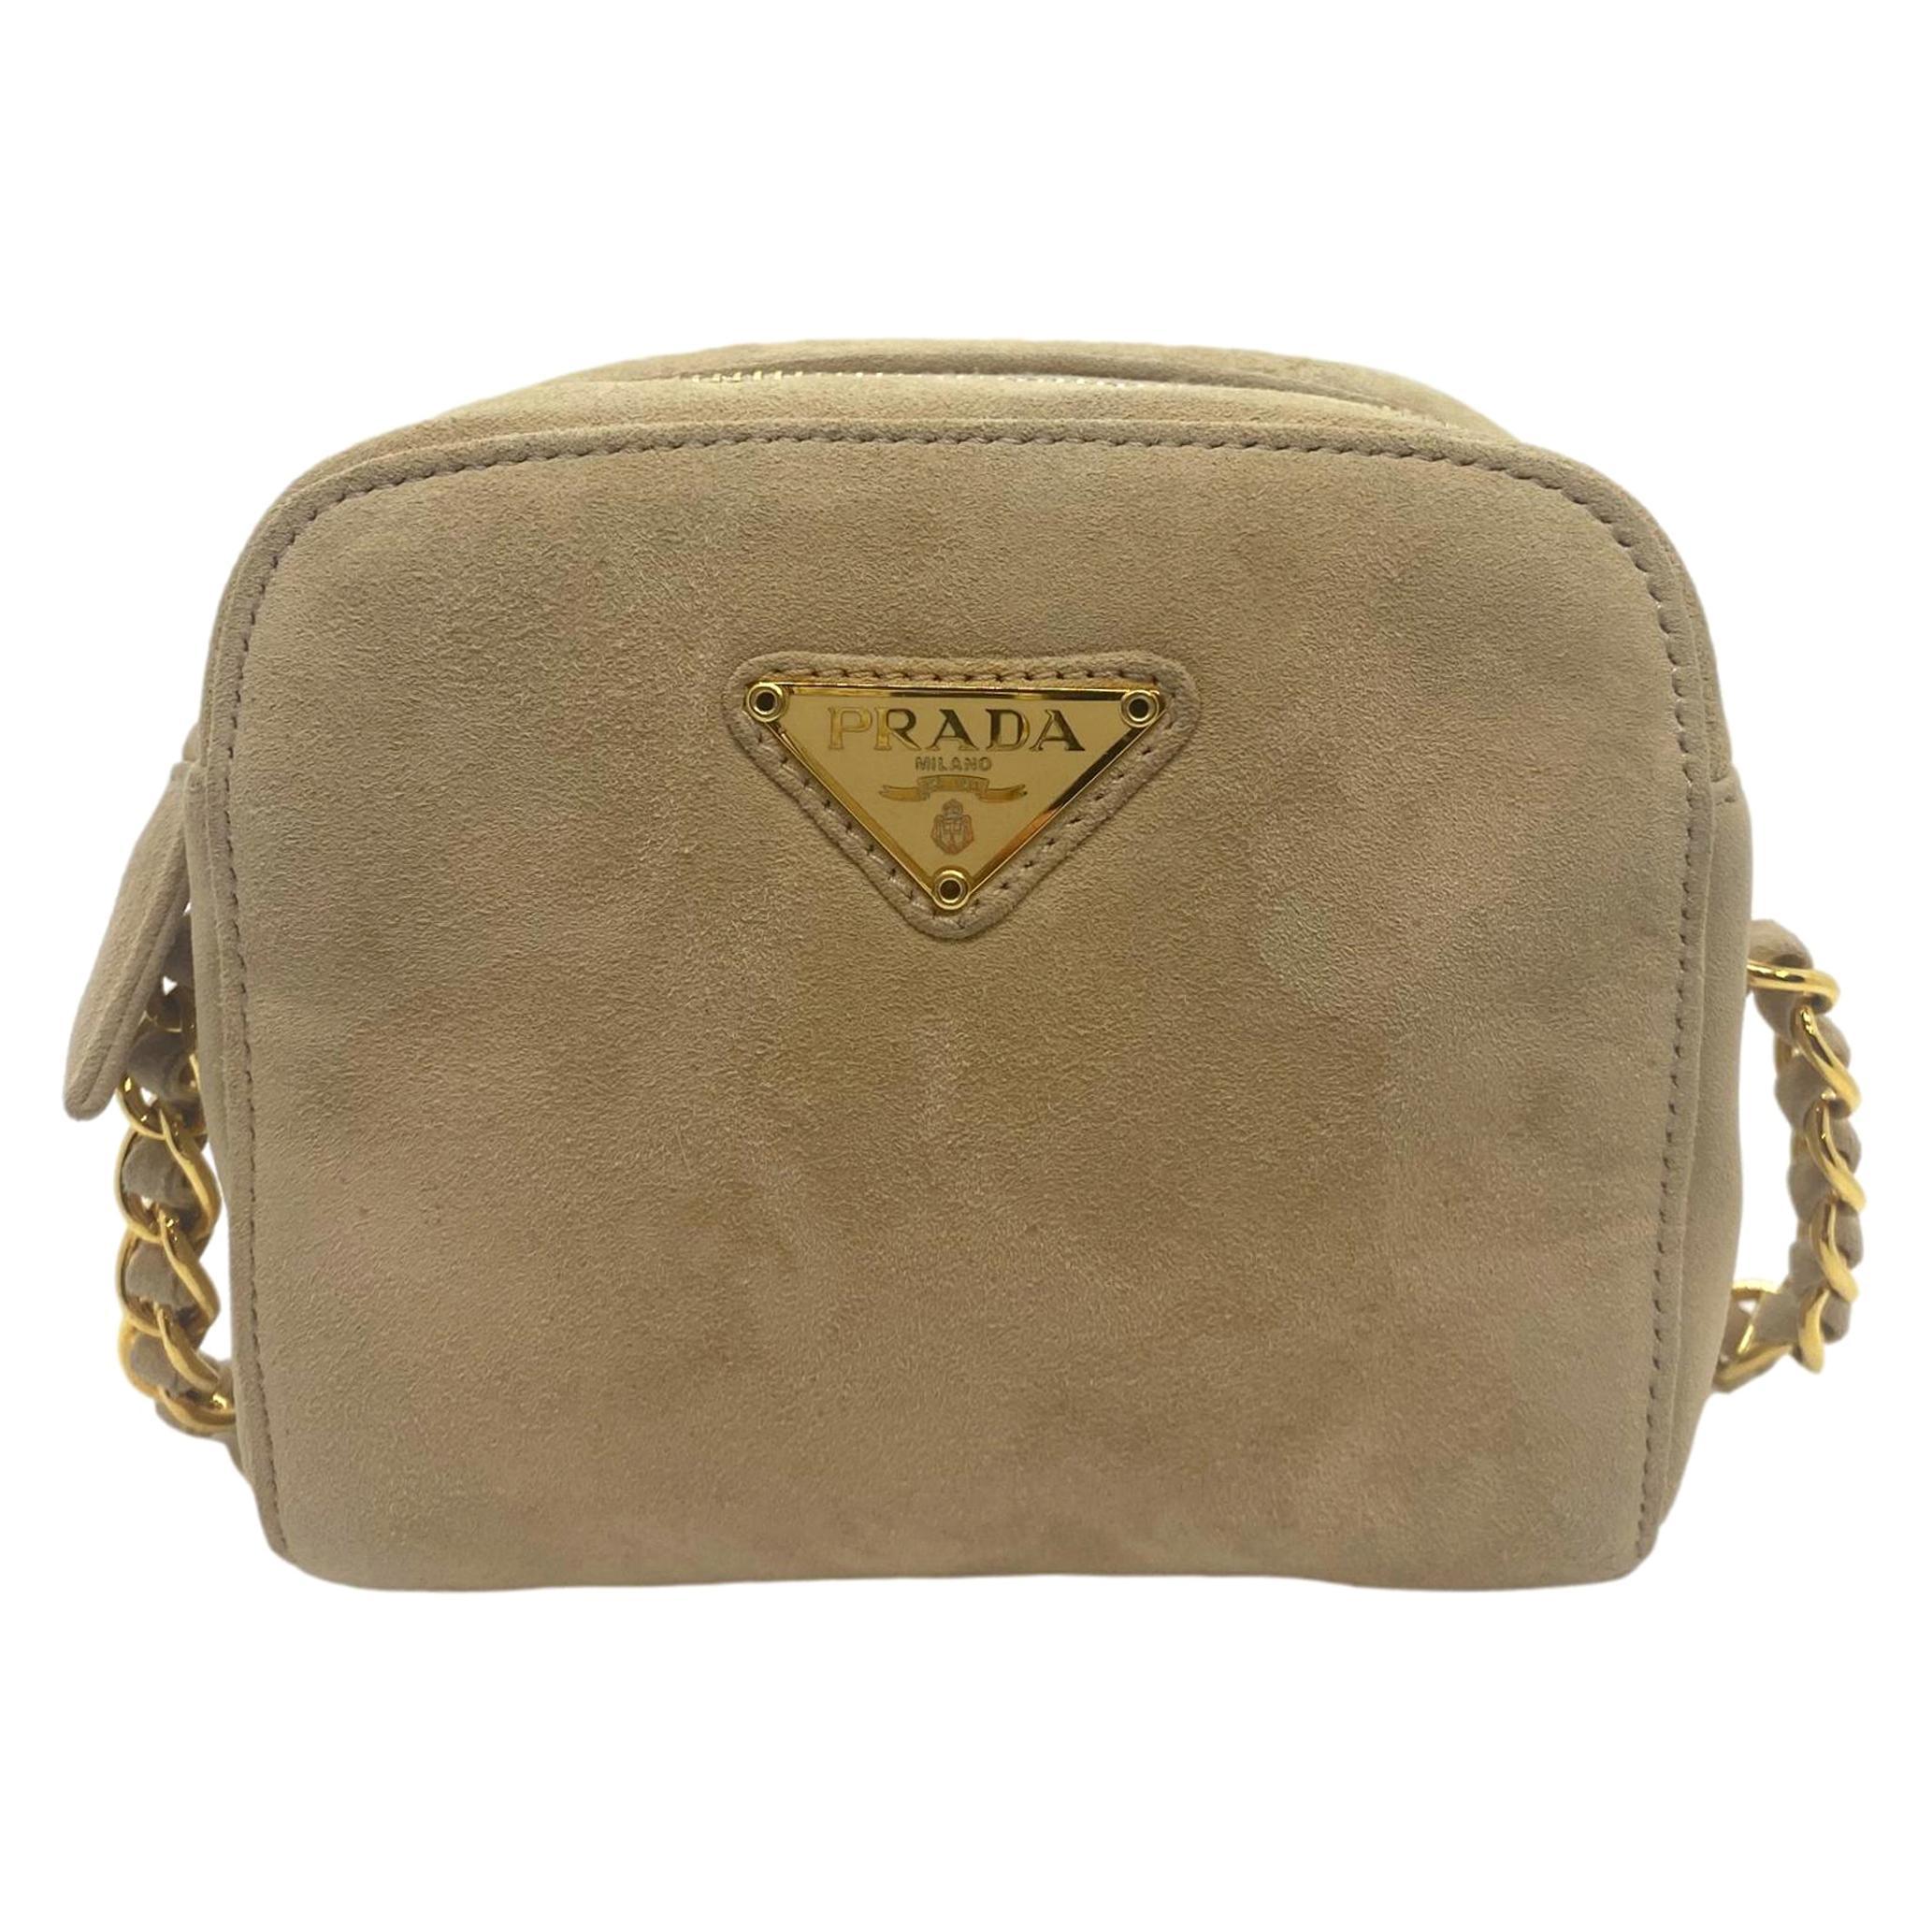 Prada Sand Suede Leather Vintage Mini Crossbody Bag, 2005.